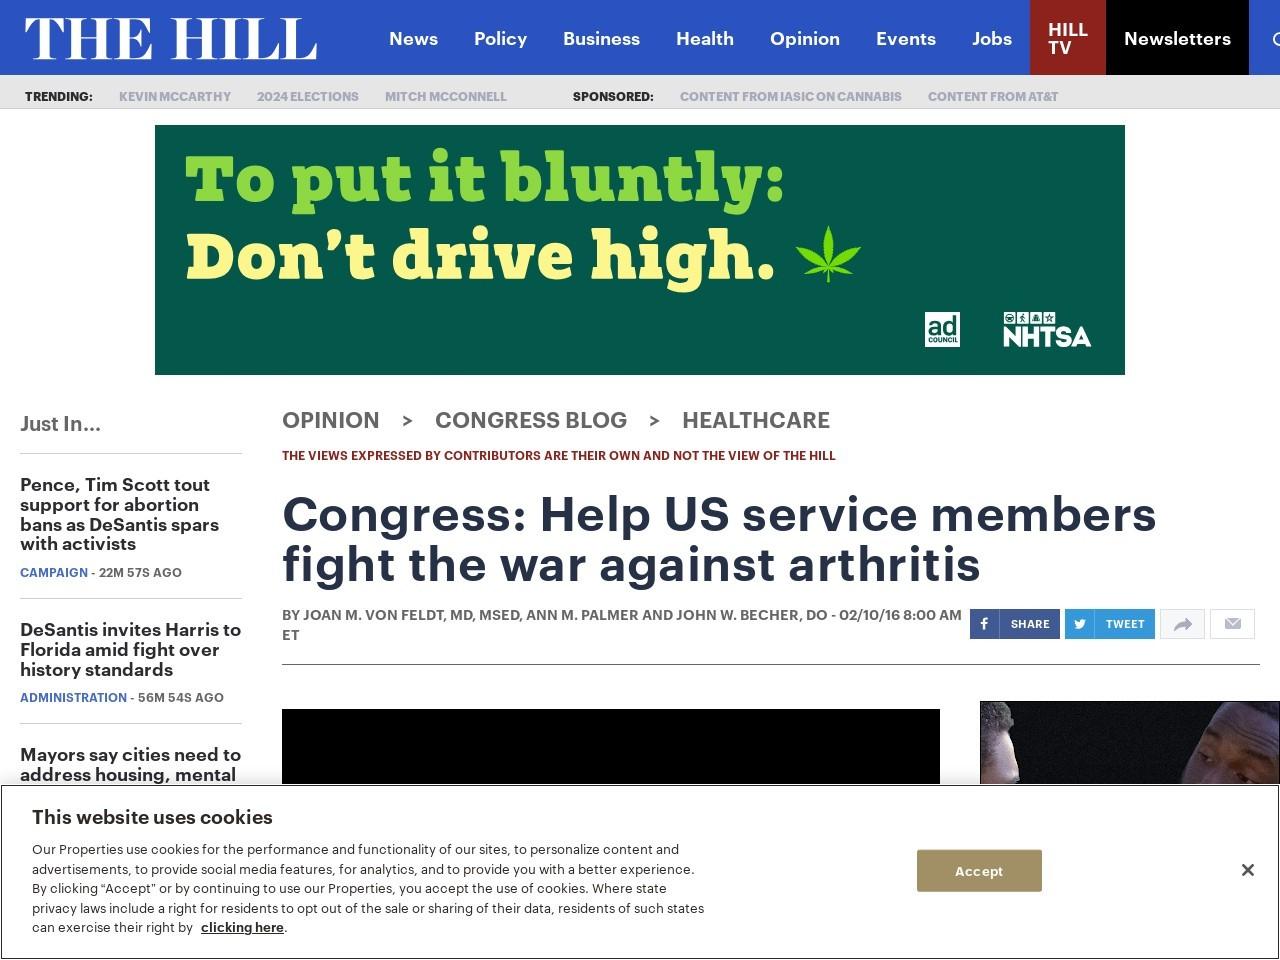 Congress: Help US service members fight the war against arthritis